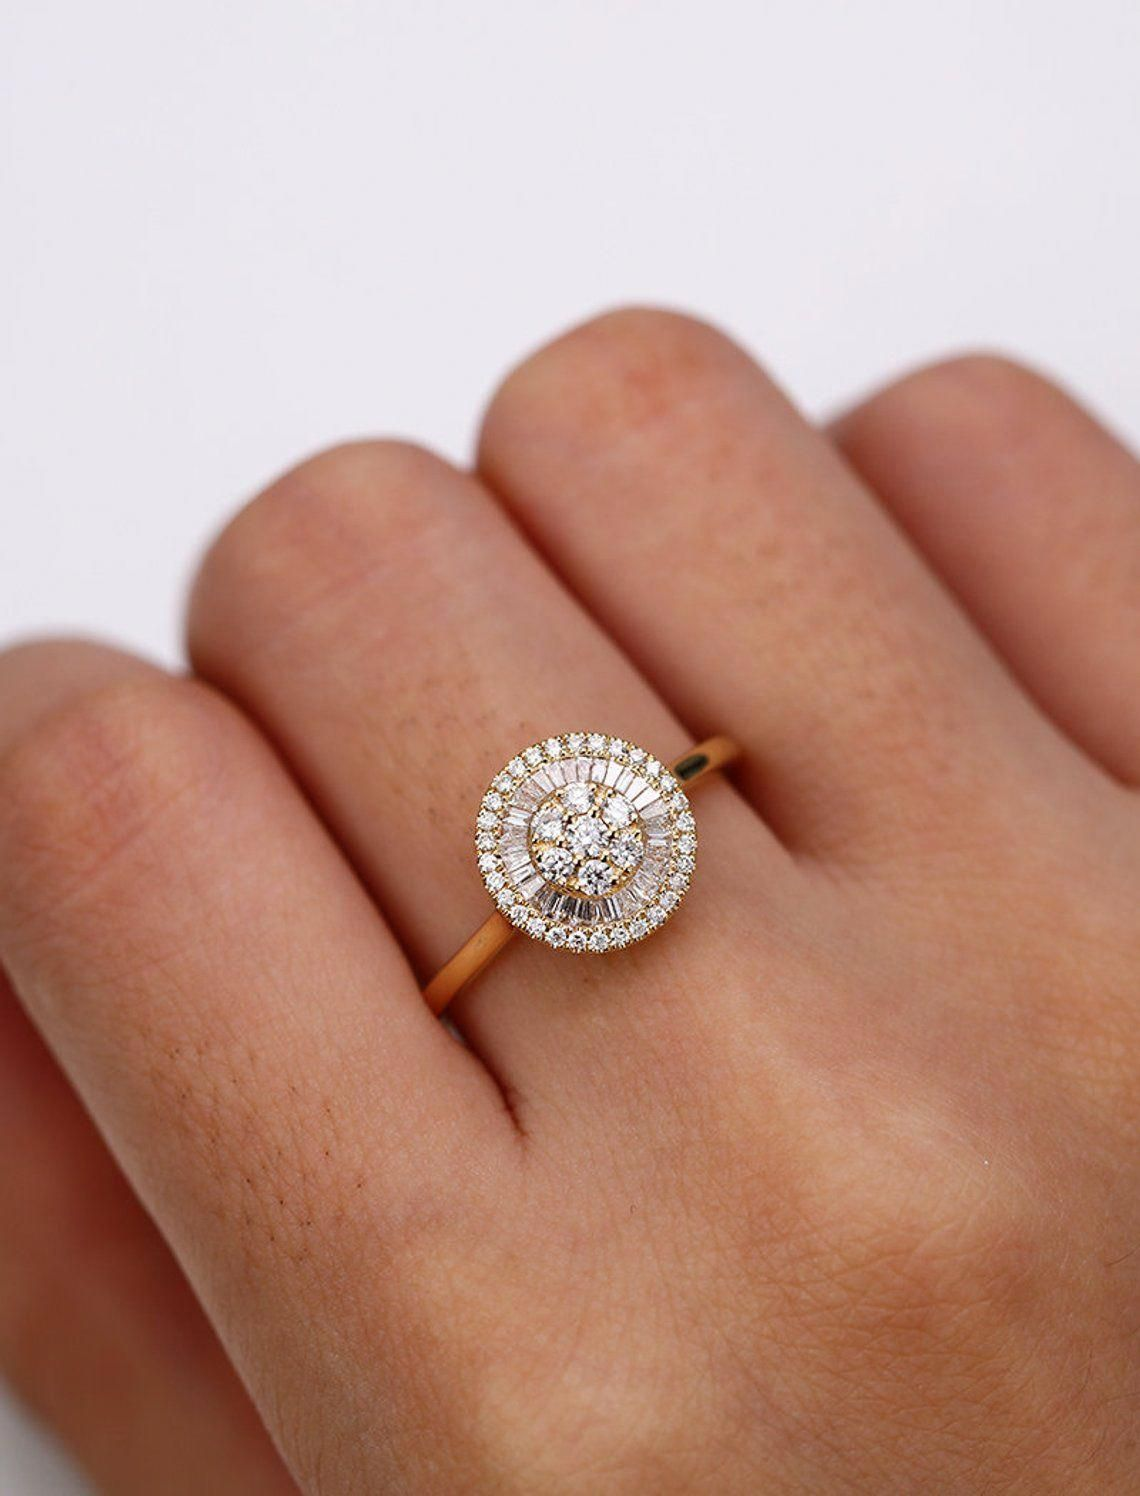 Natural topaz engagement ring 14k rose gold diamond